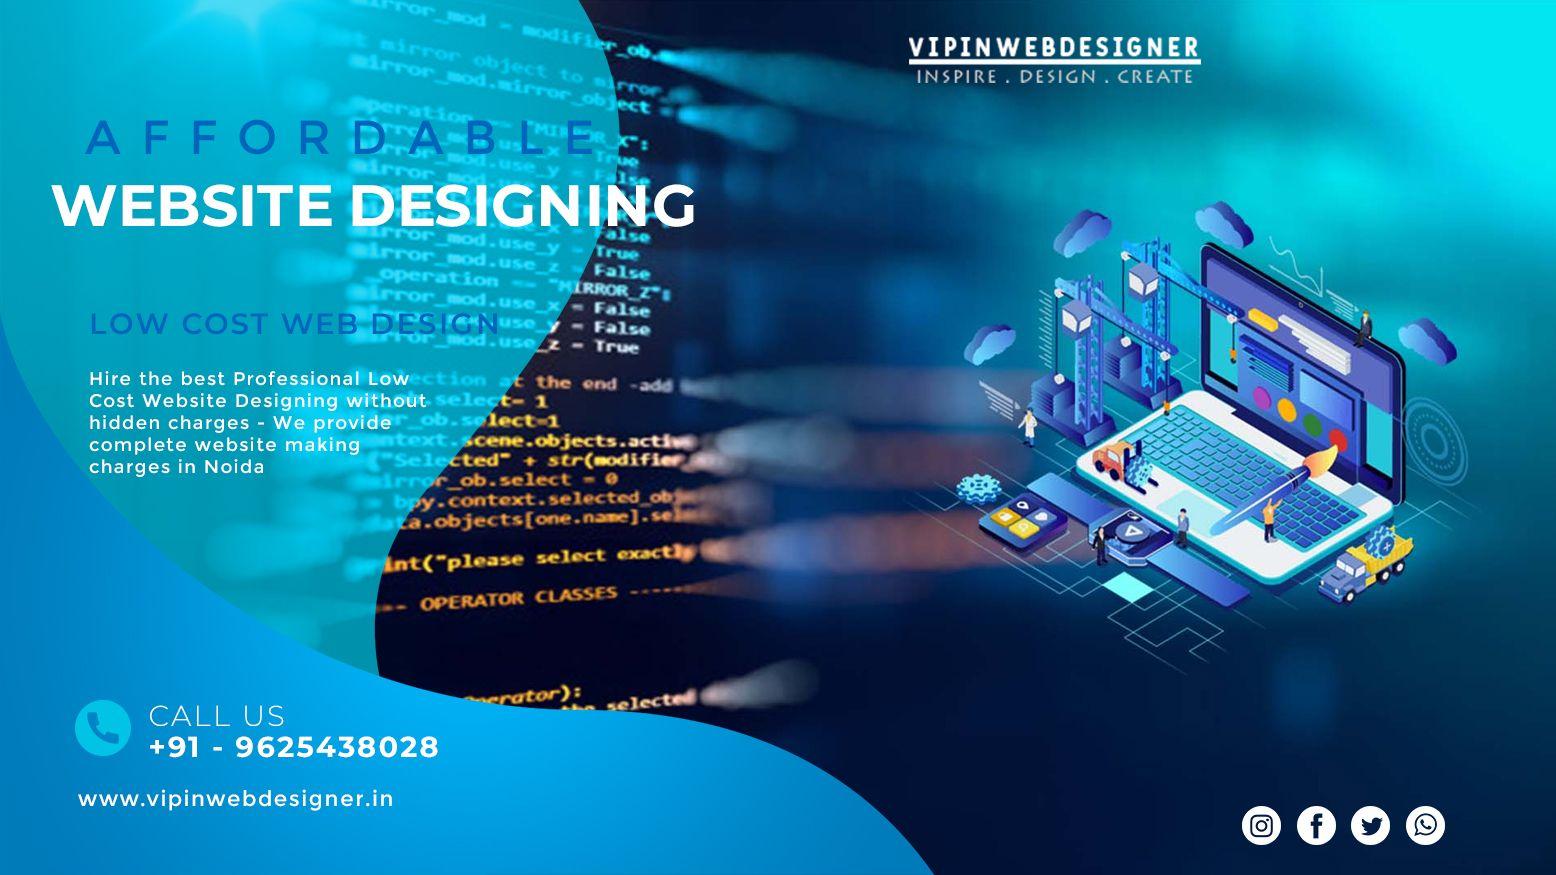 Web Designing Services In Noida In 2020 Website Design Web Development Design Freelancer Website